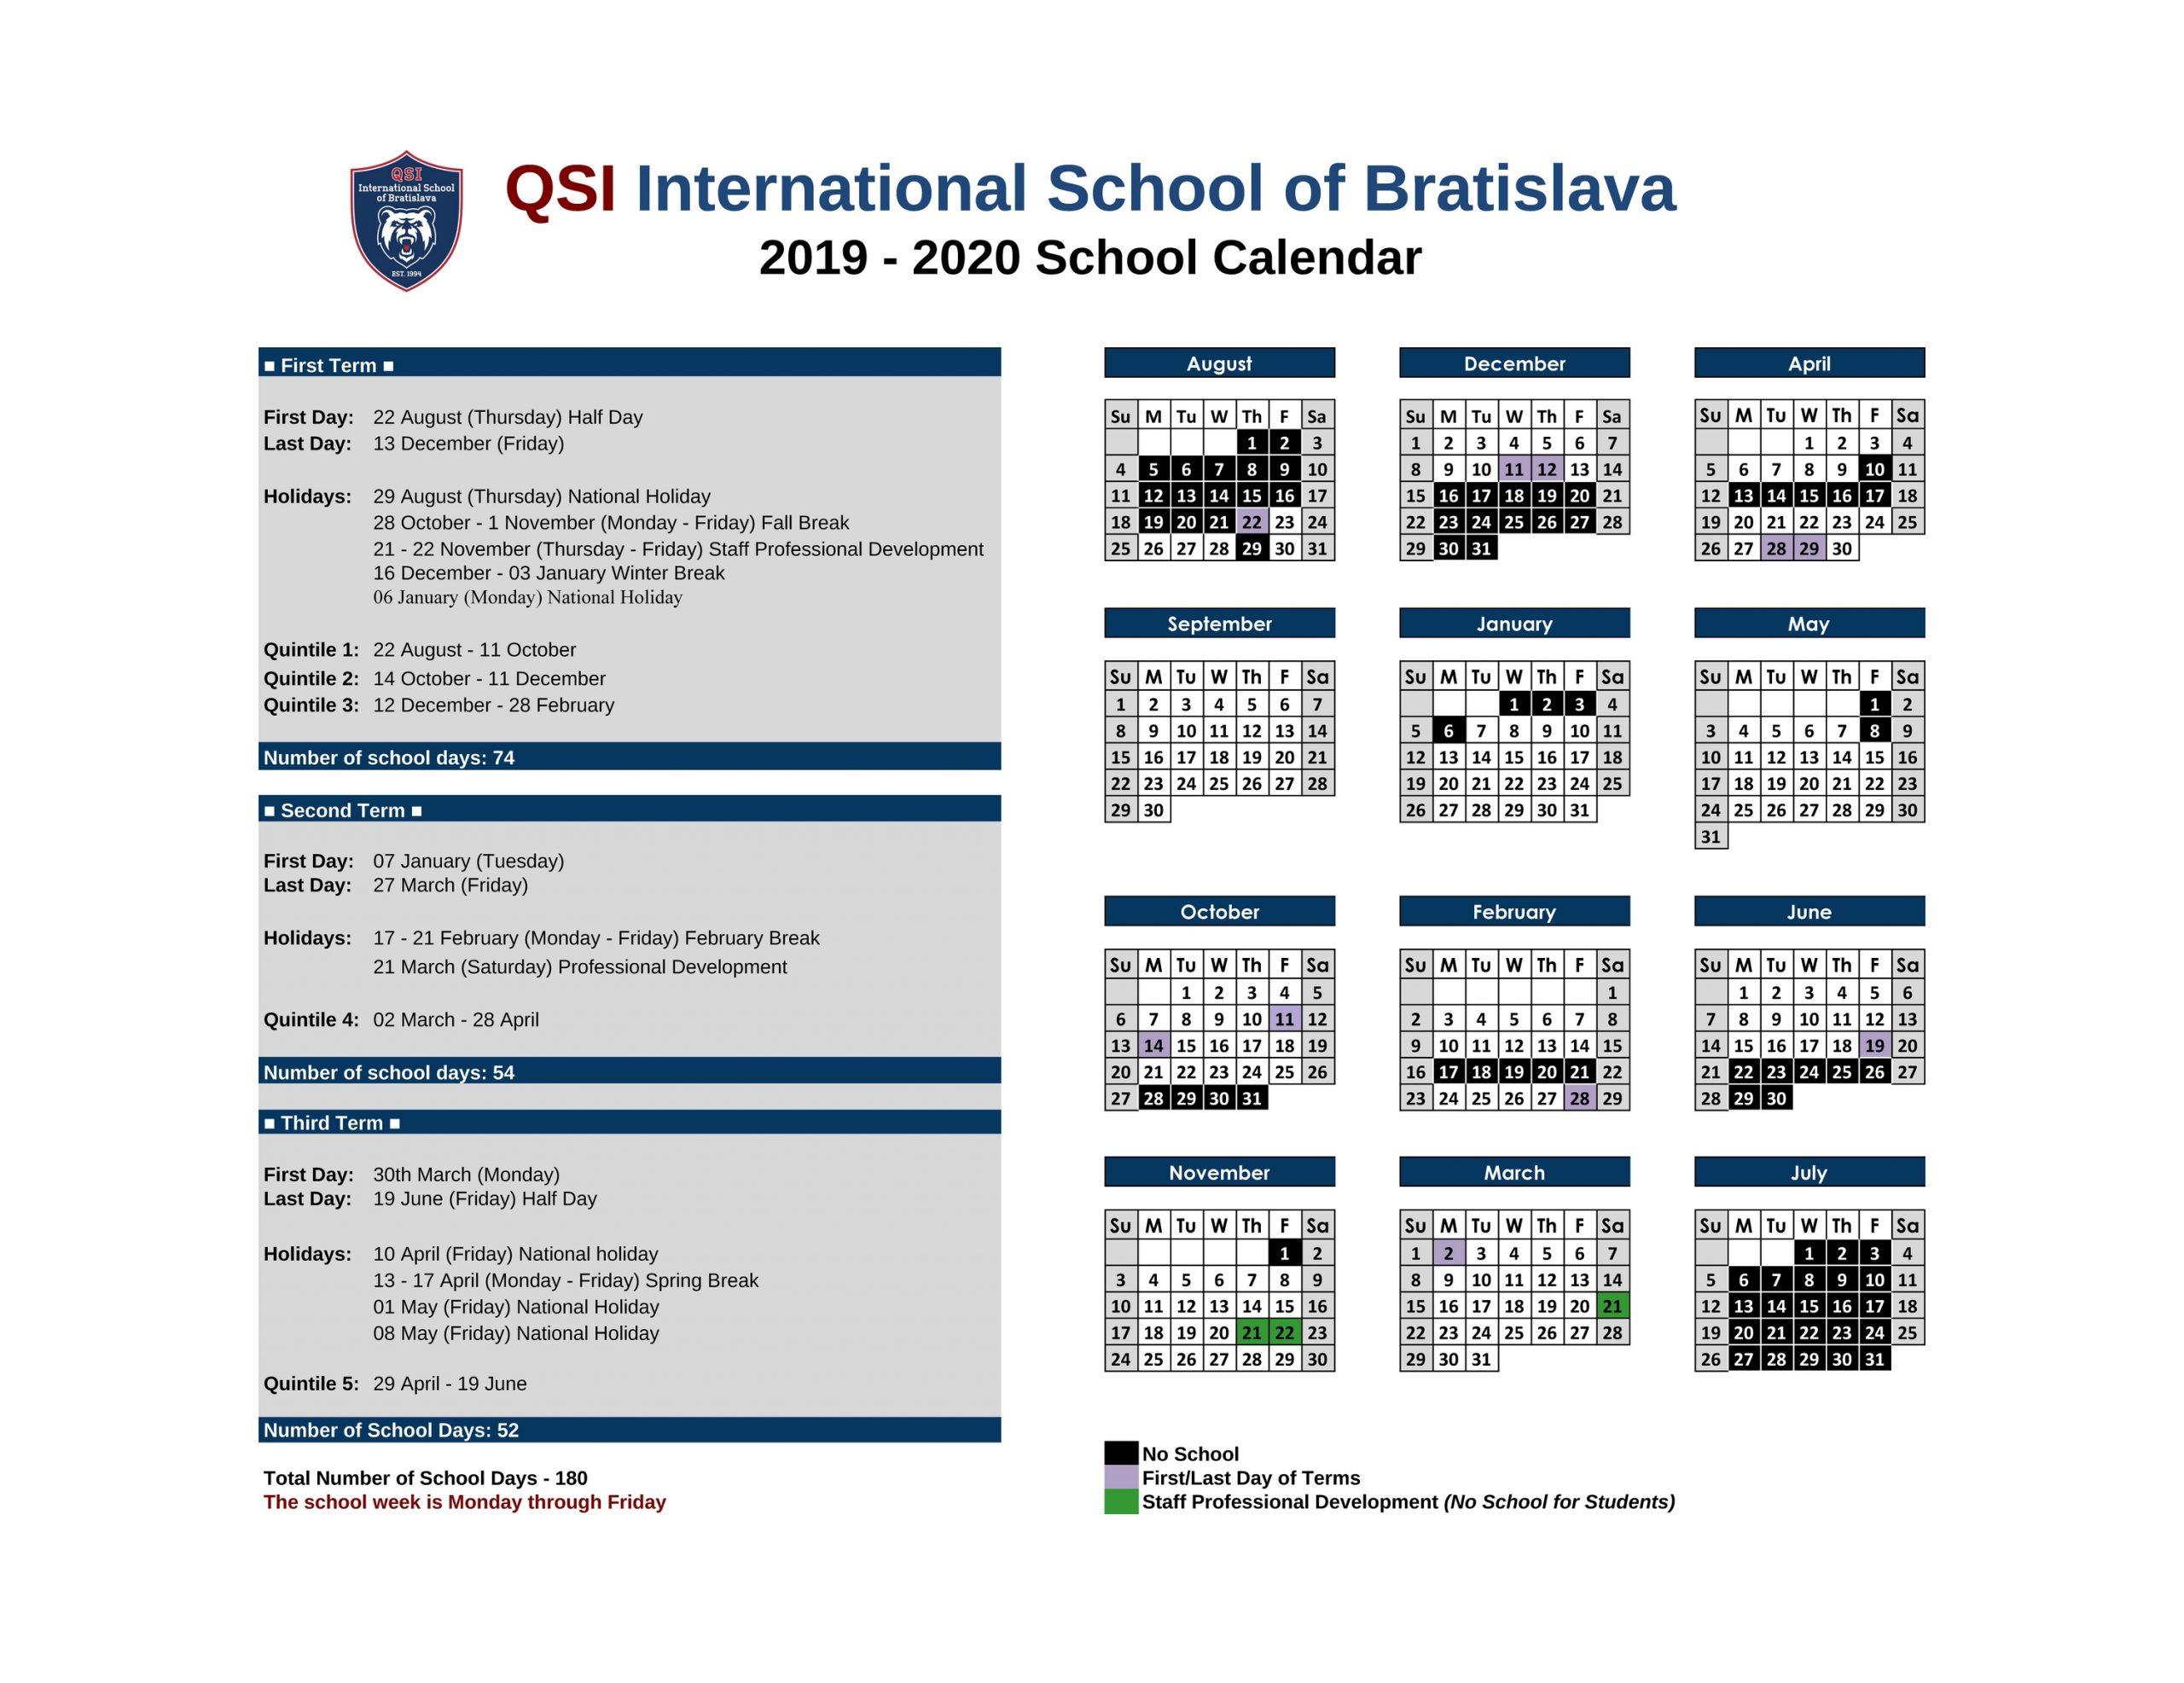 School Calendar 2020-2021 | Qsi International School Of